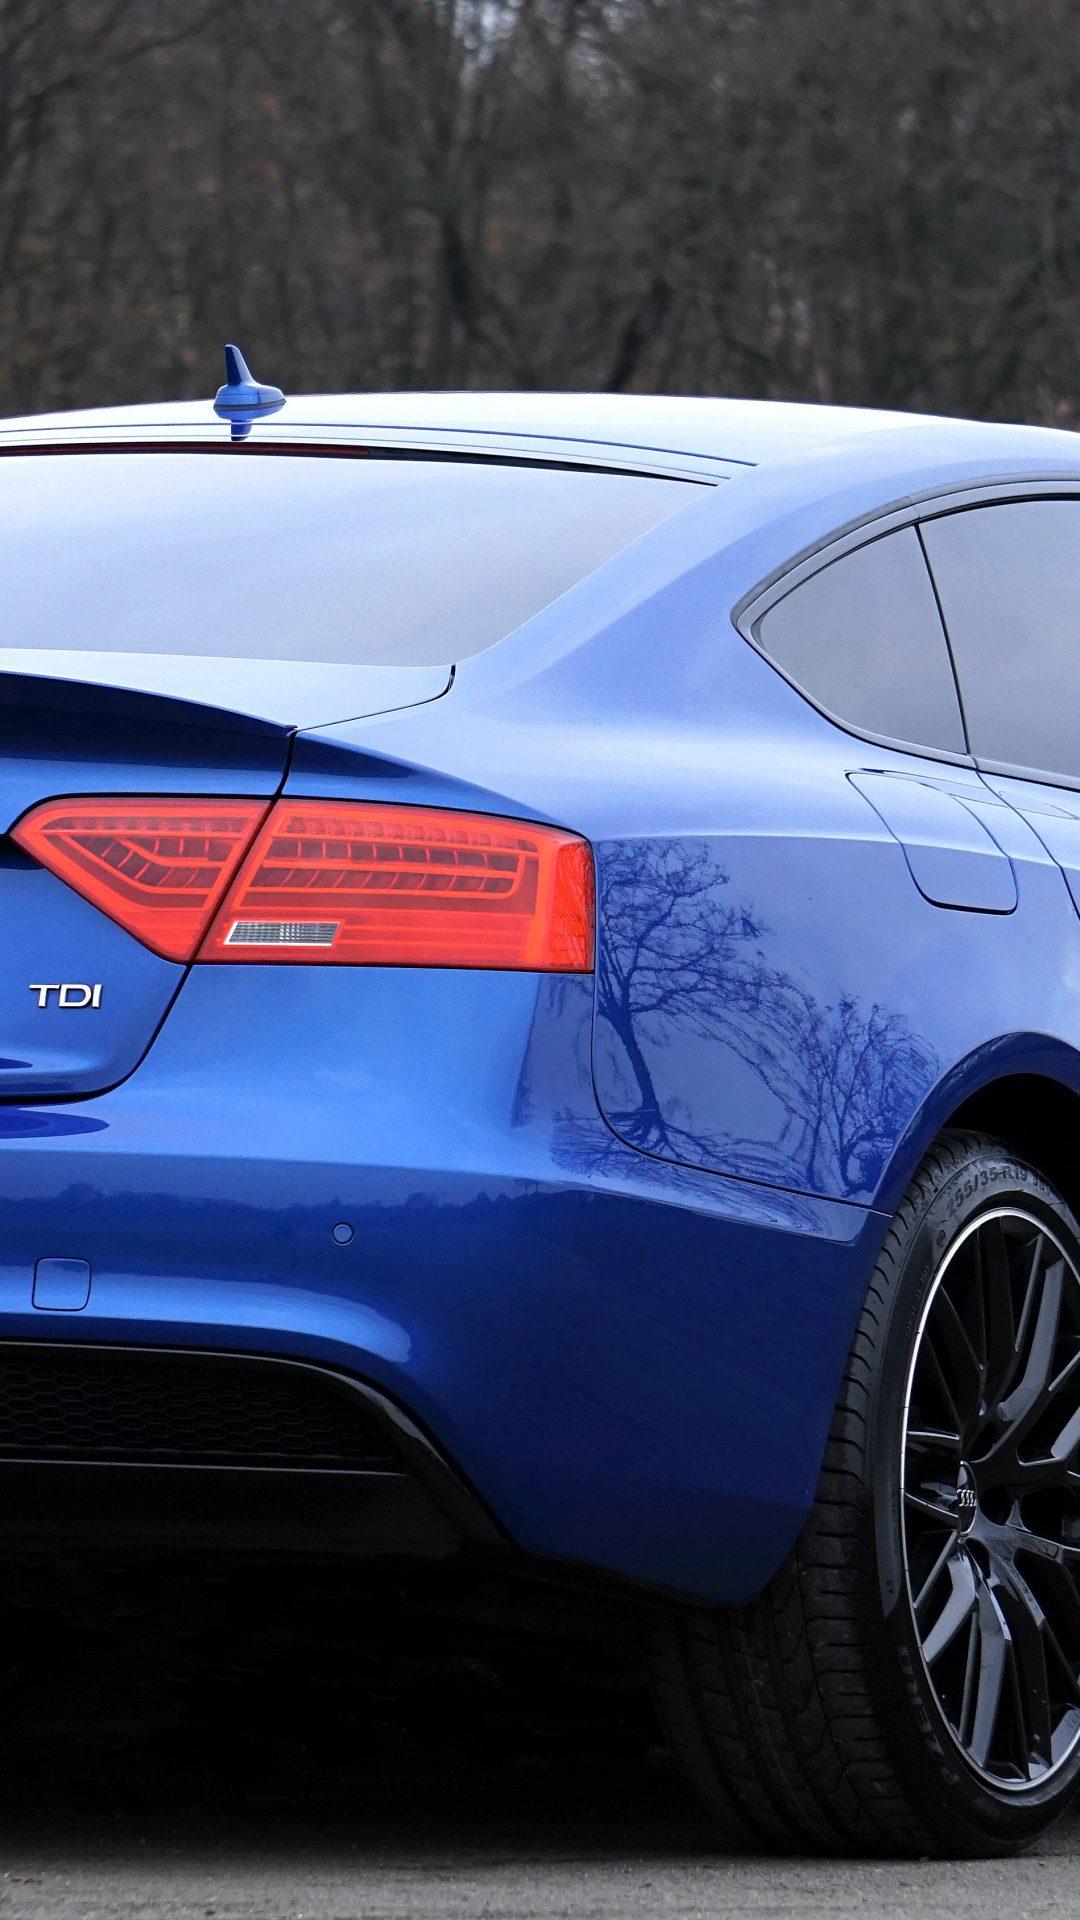 Audi A5 Blue Wallpaper 4k 5k Hd Wallpaper Background